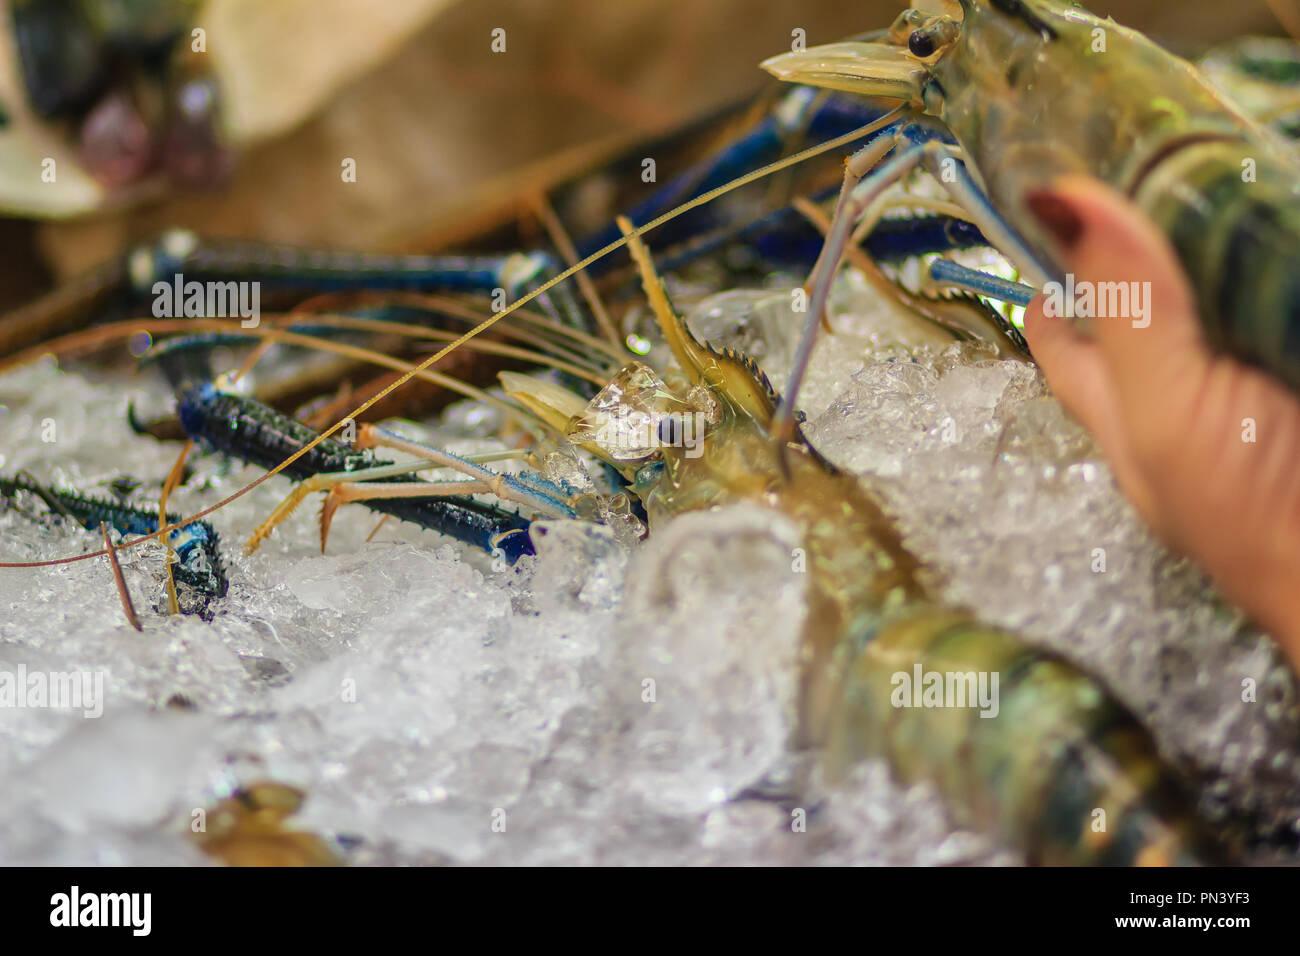 Extra large size of giant malaysian prawn (Macrobrachium